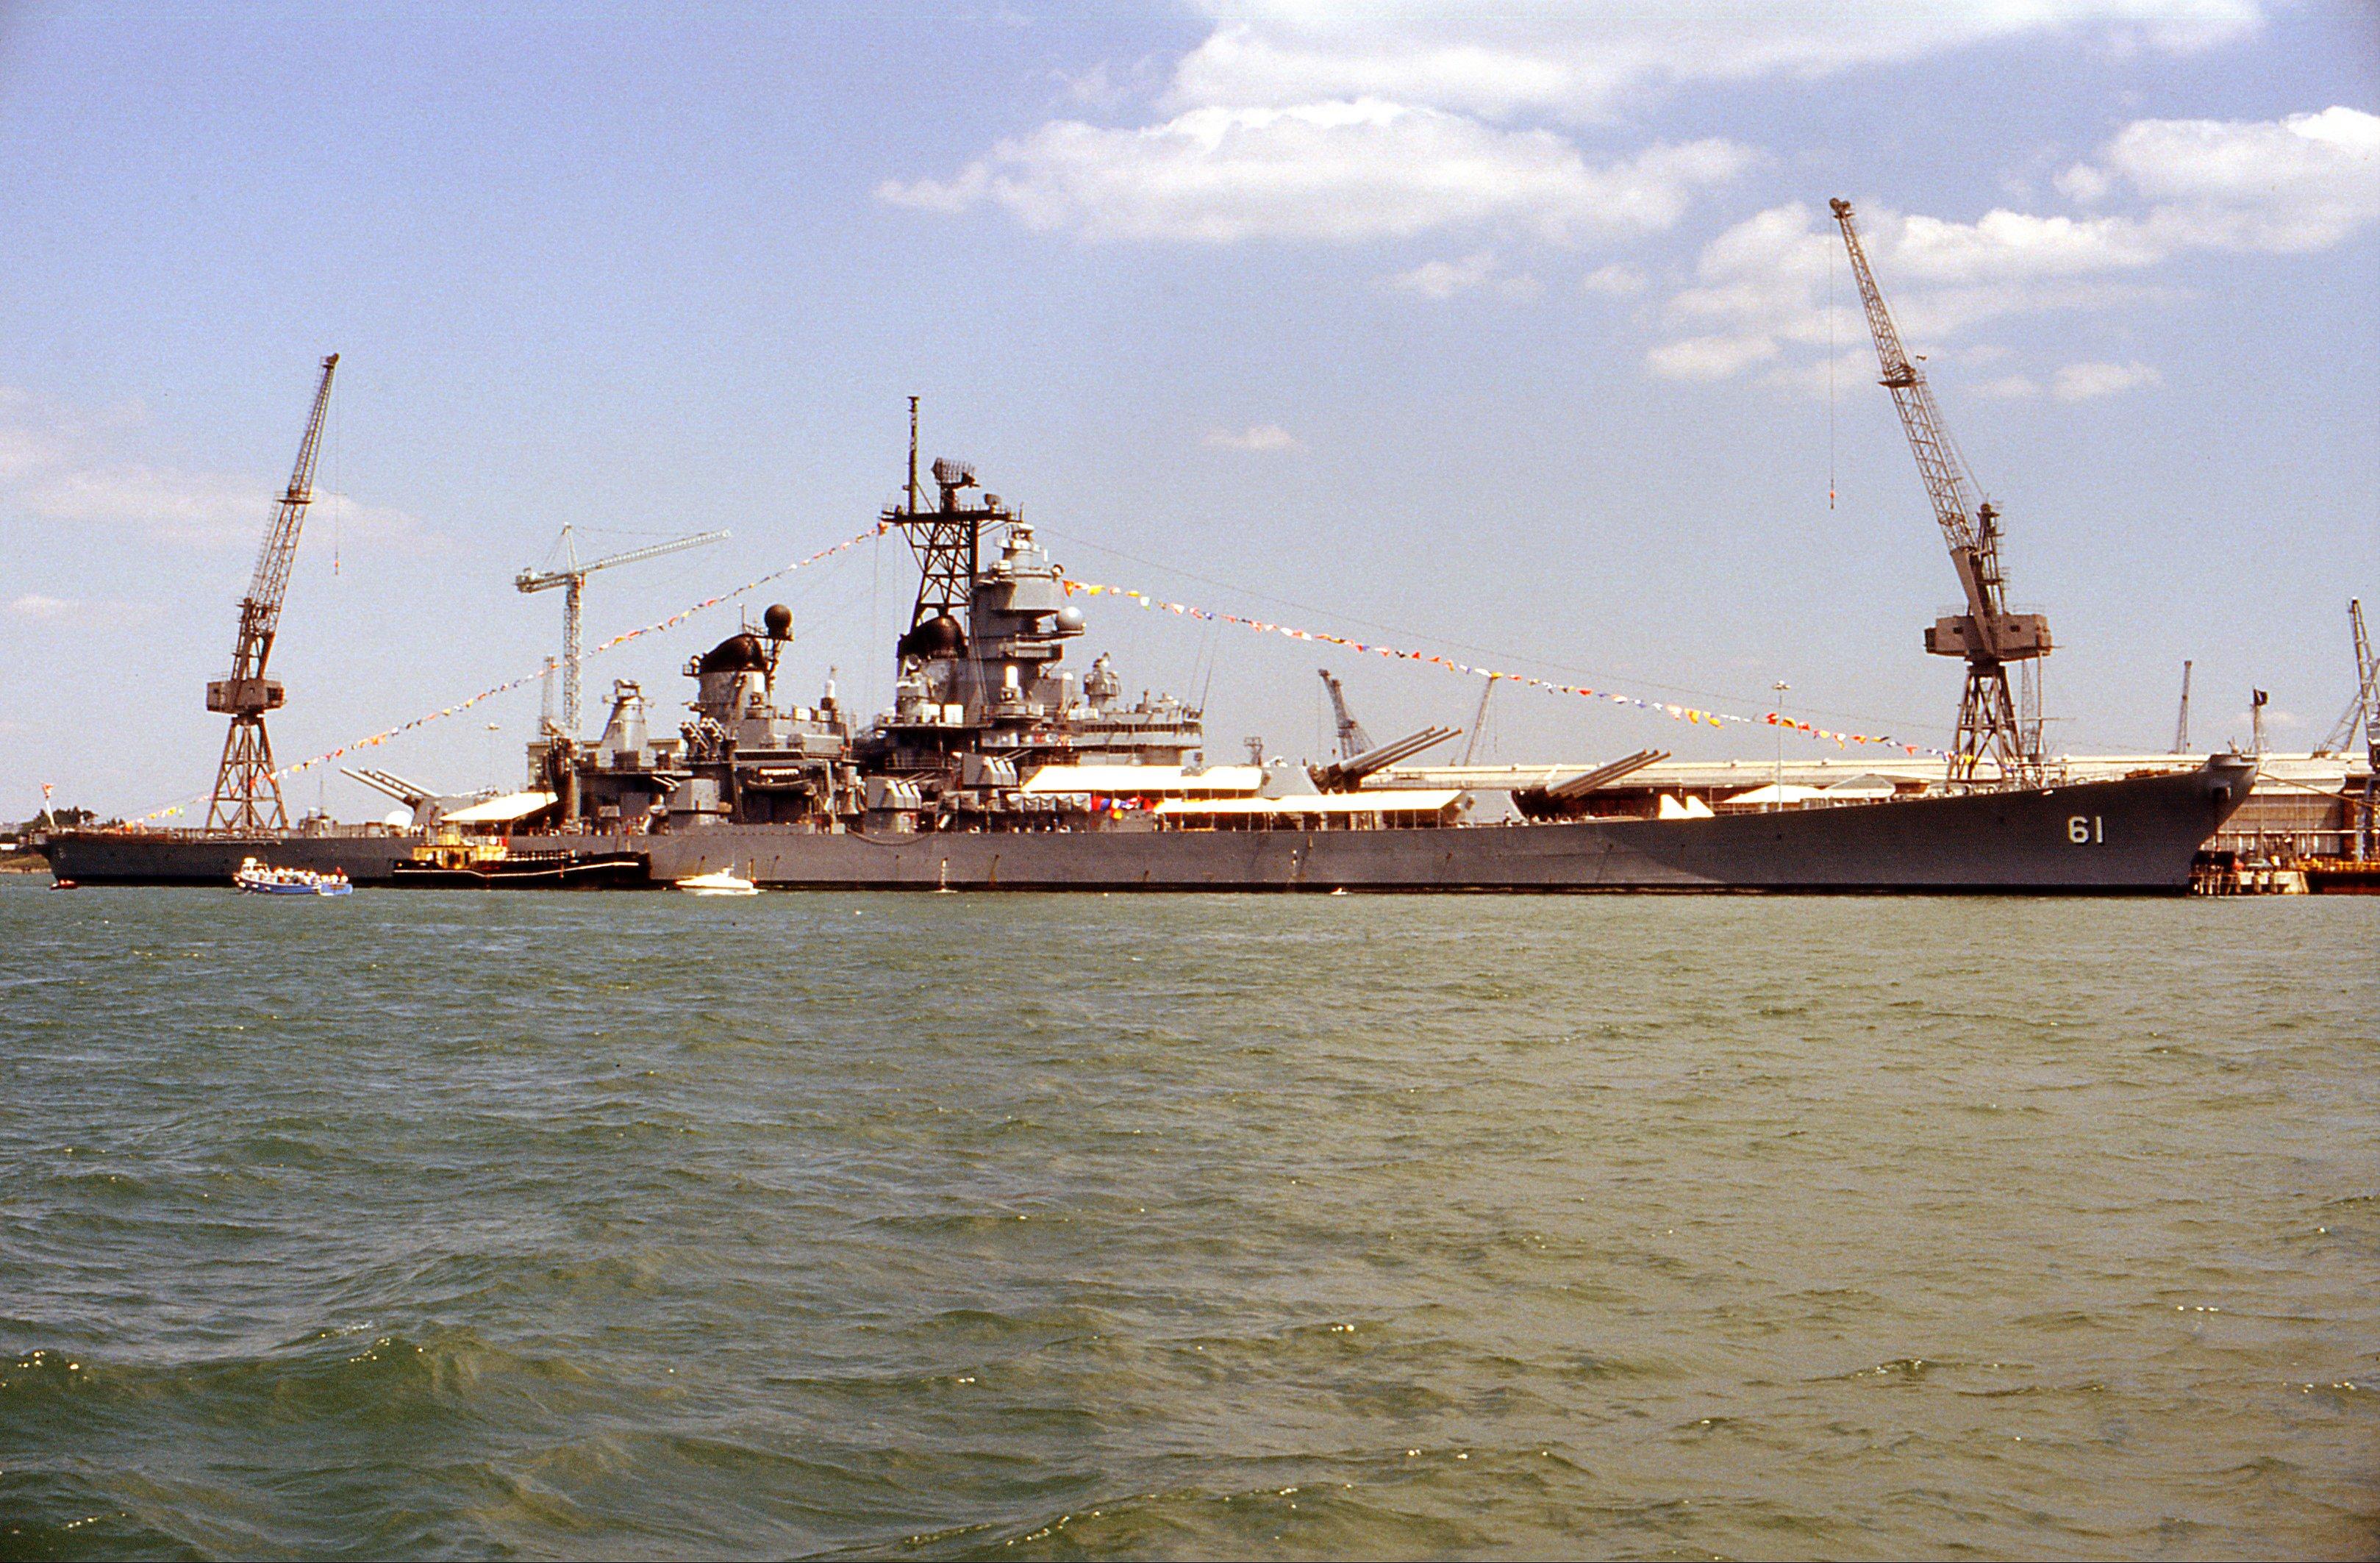 File:USS Iowa, Portsmouth, Great Britain, July 1989 (2) jpg